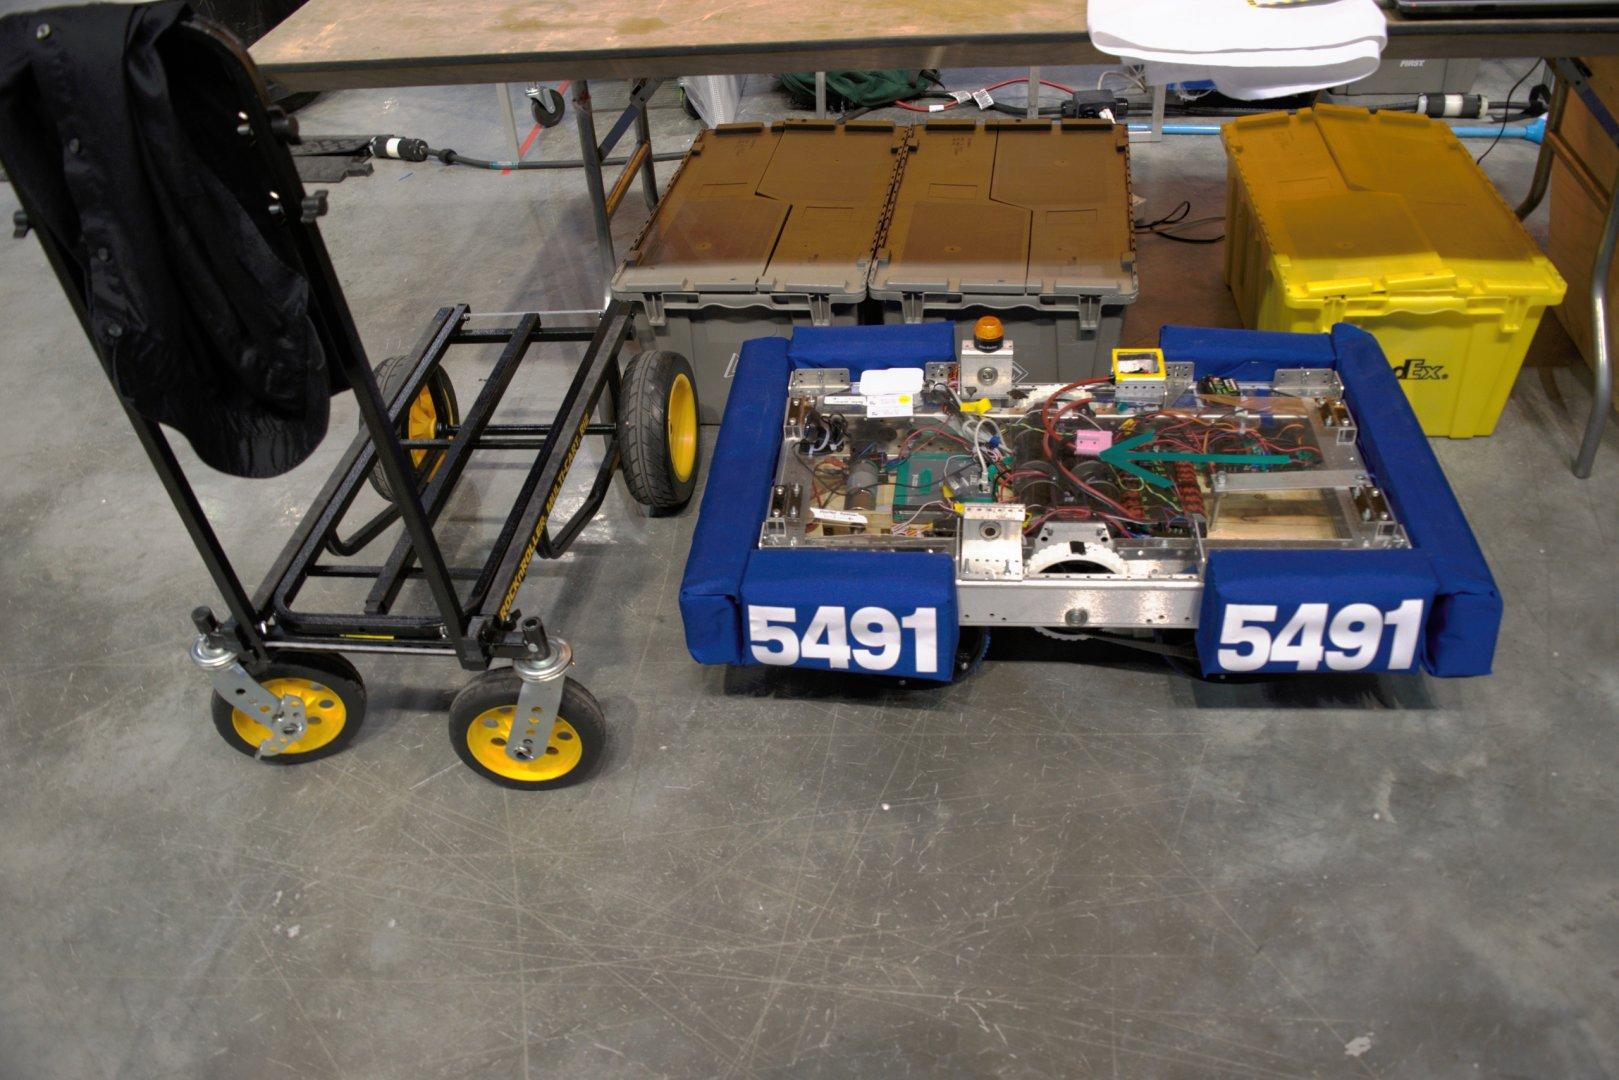 043.Boston FIRST Robotics Competition 04-03-2016.jpg